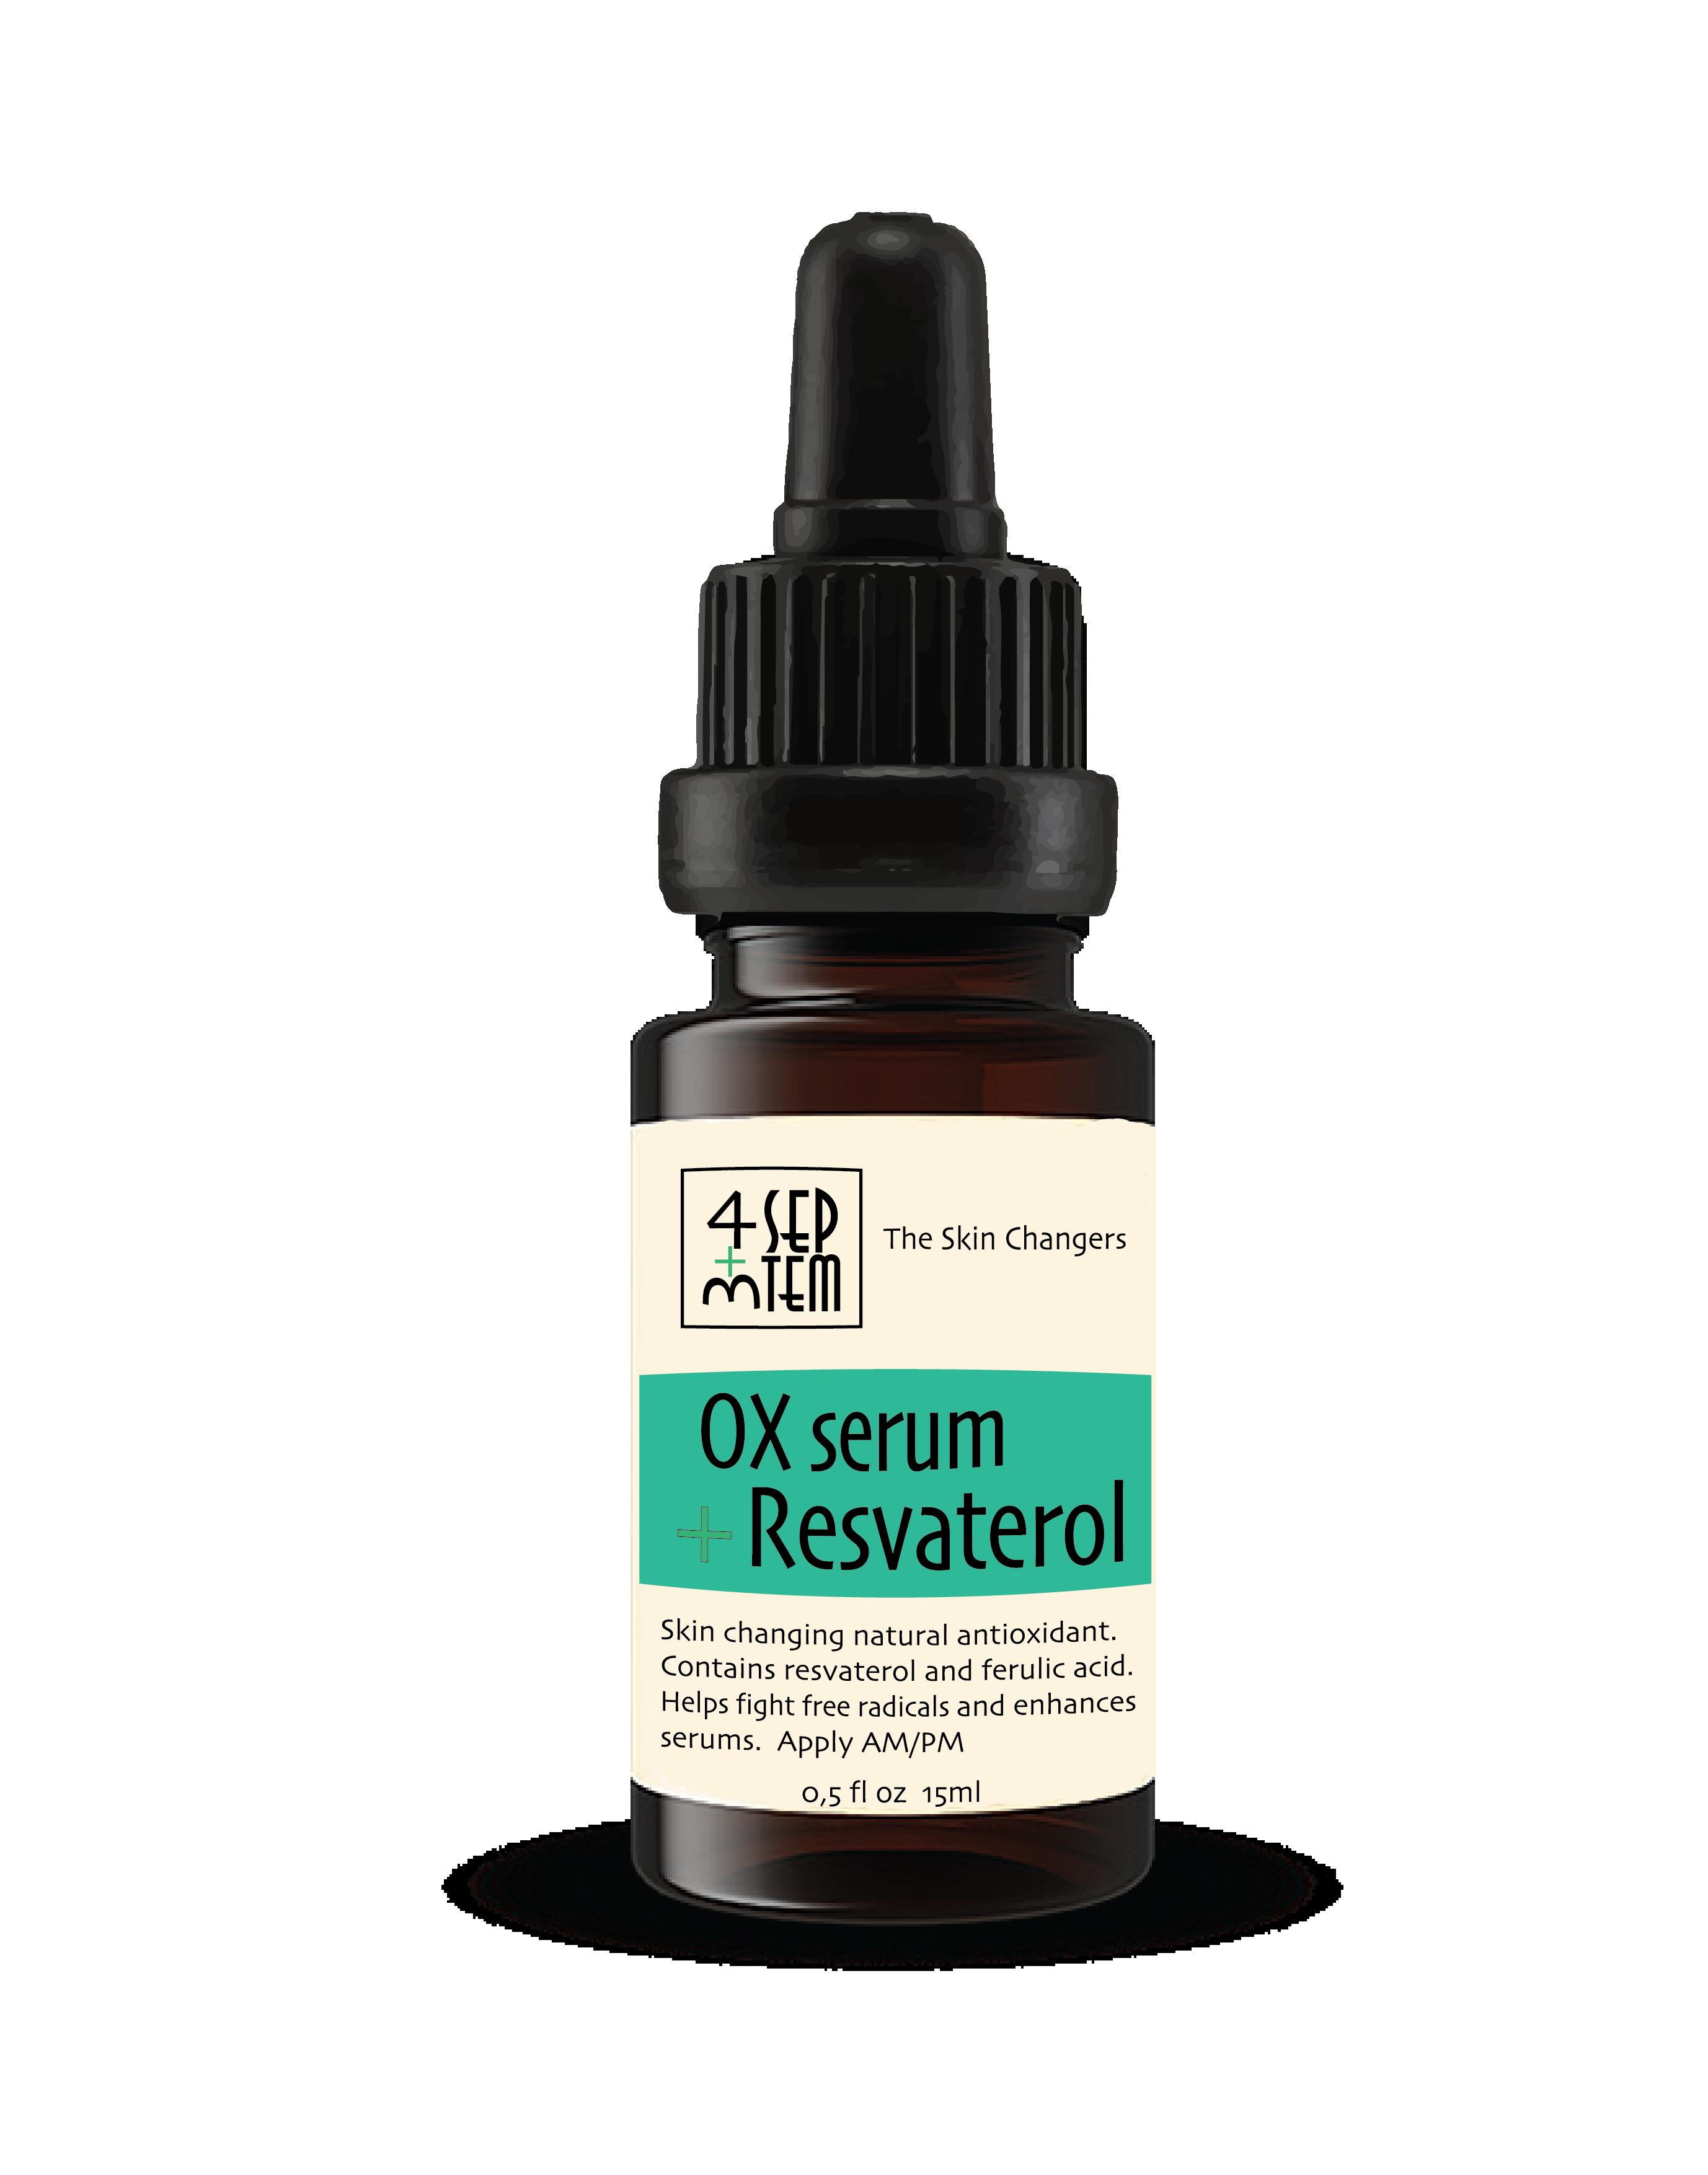 Septem Ox Regenerative serum